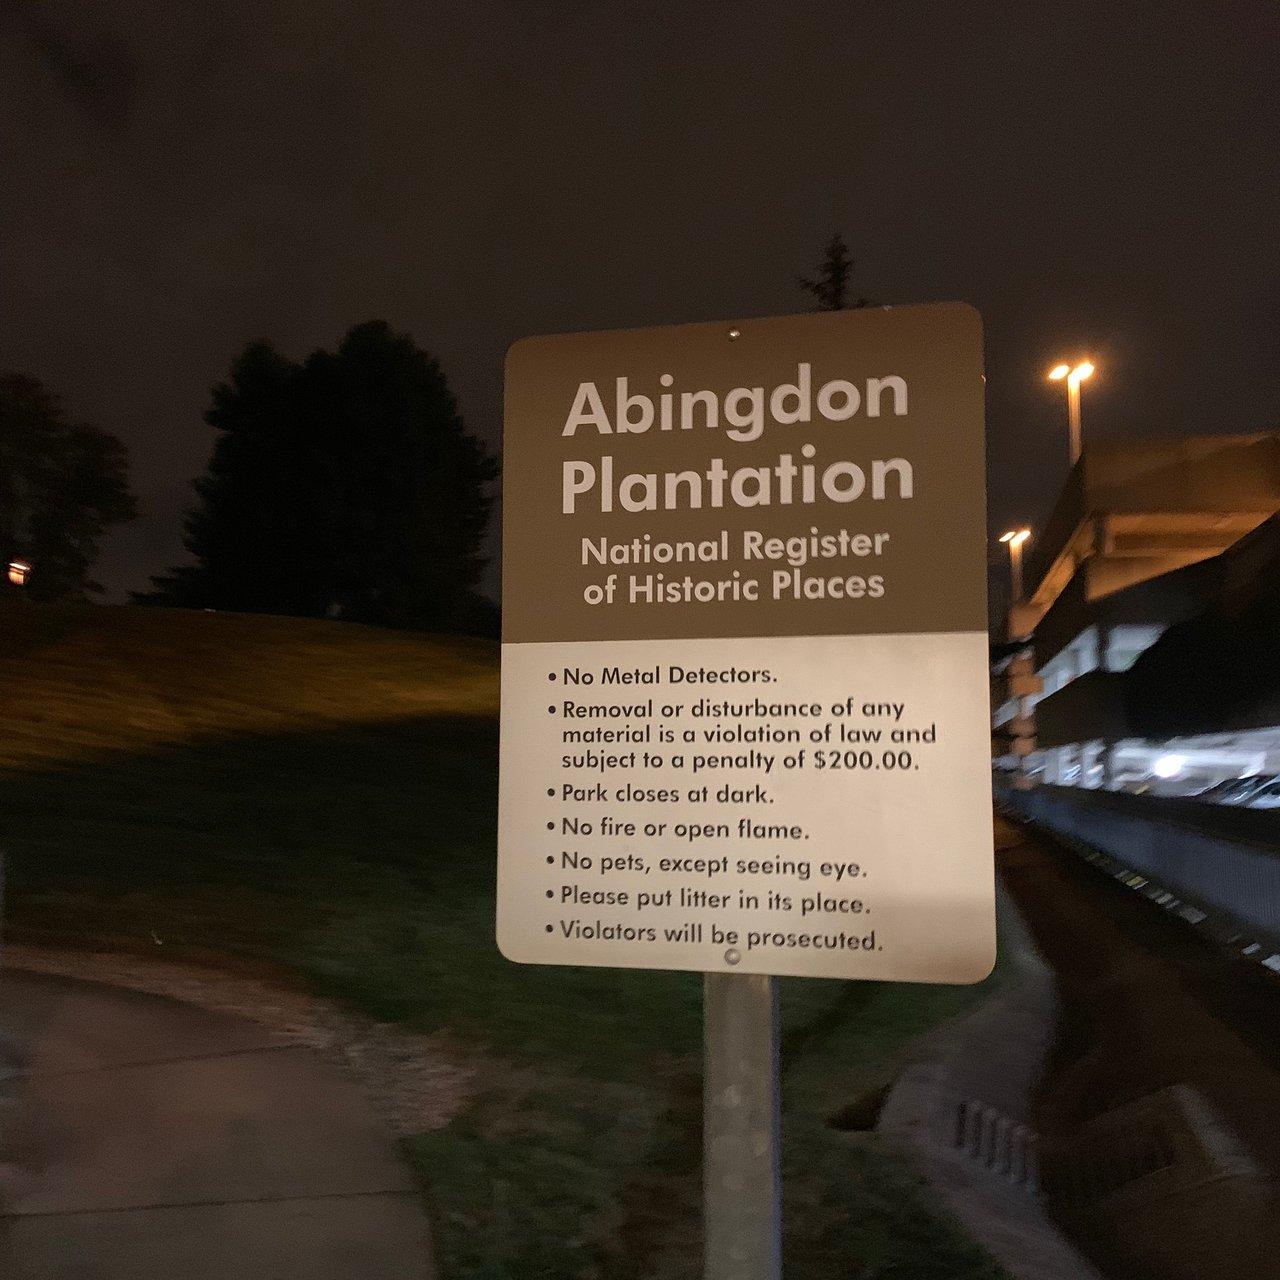 Abingdon Plantation Alexandria 2020 All You Need To Know